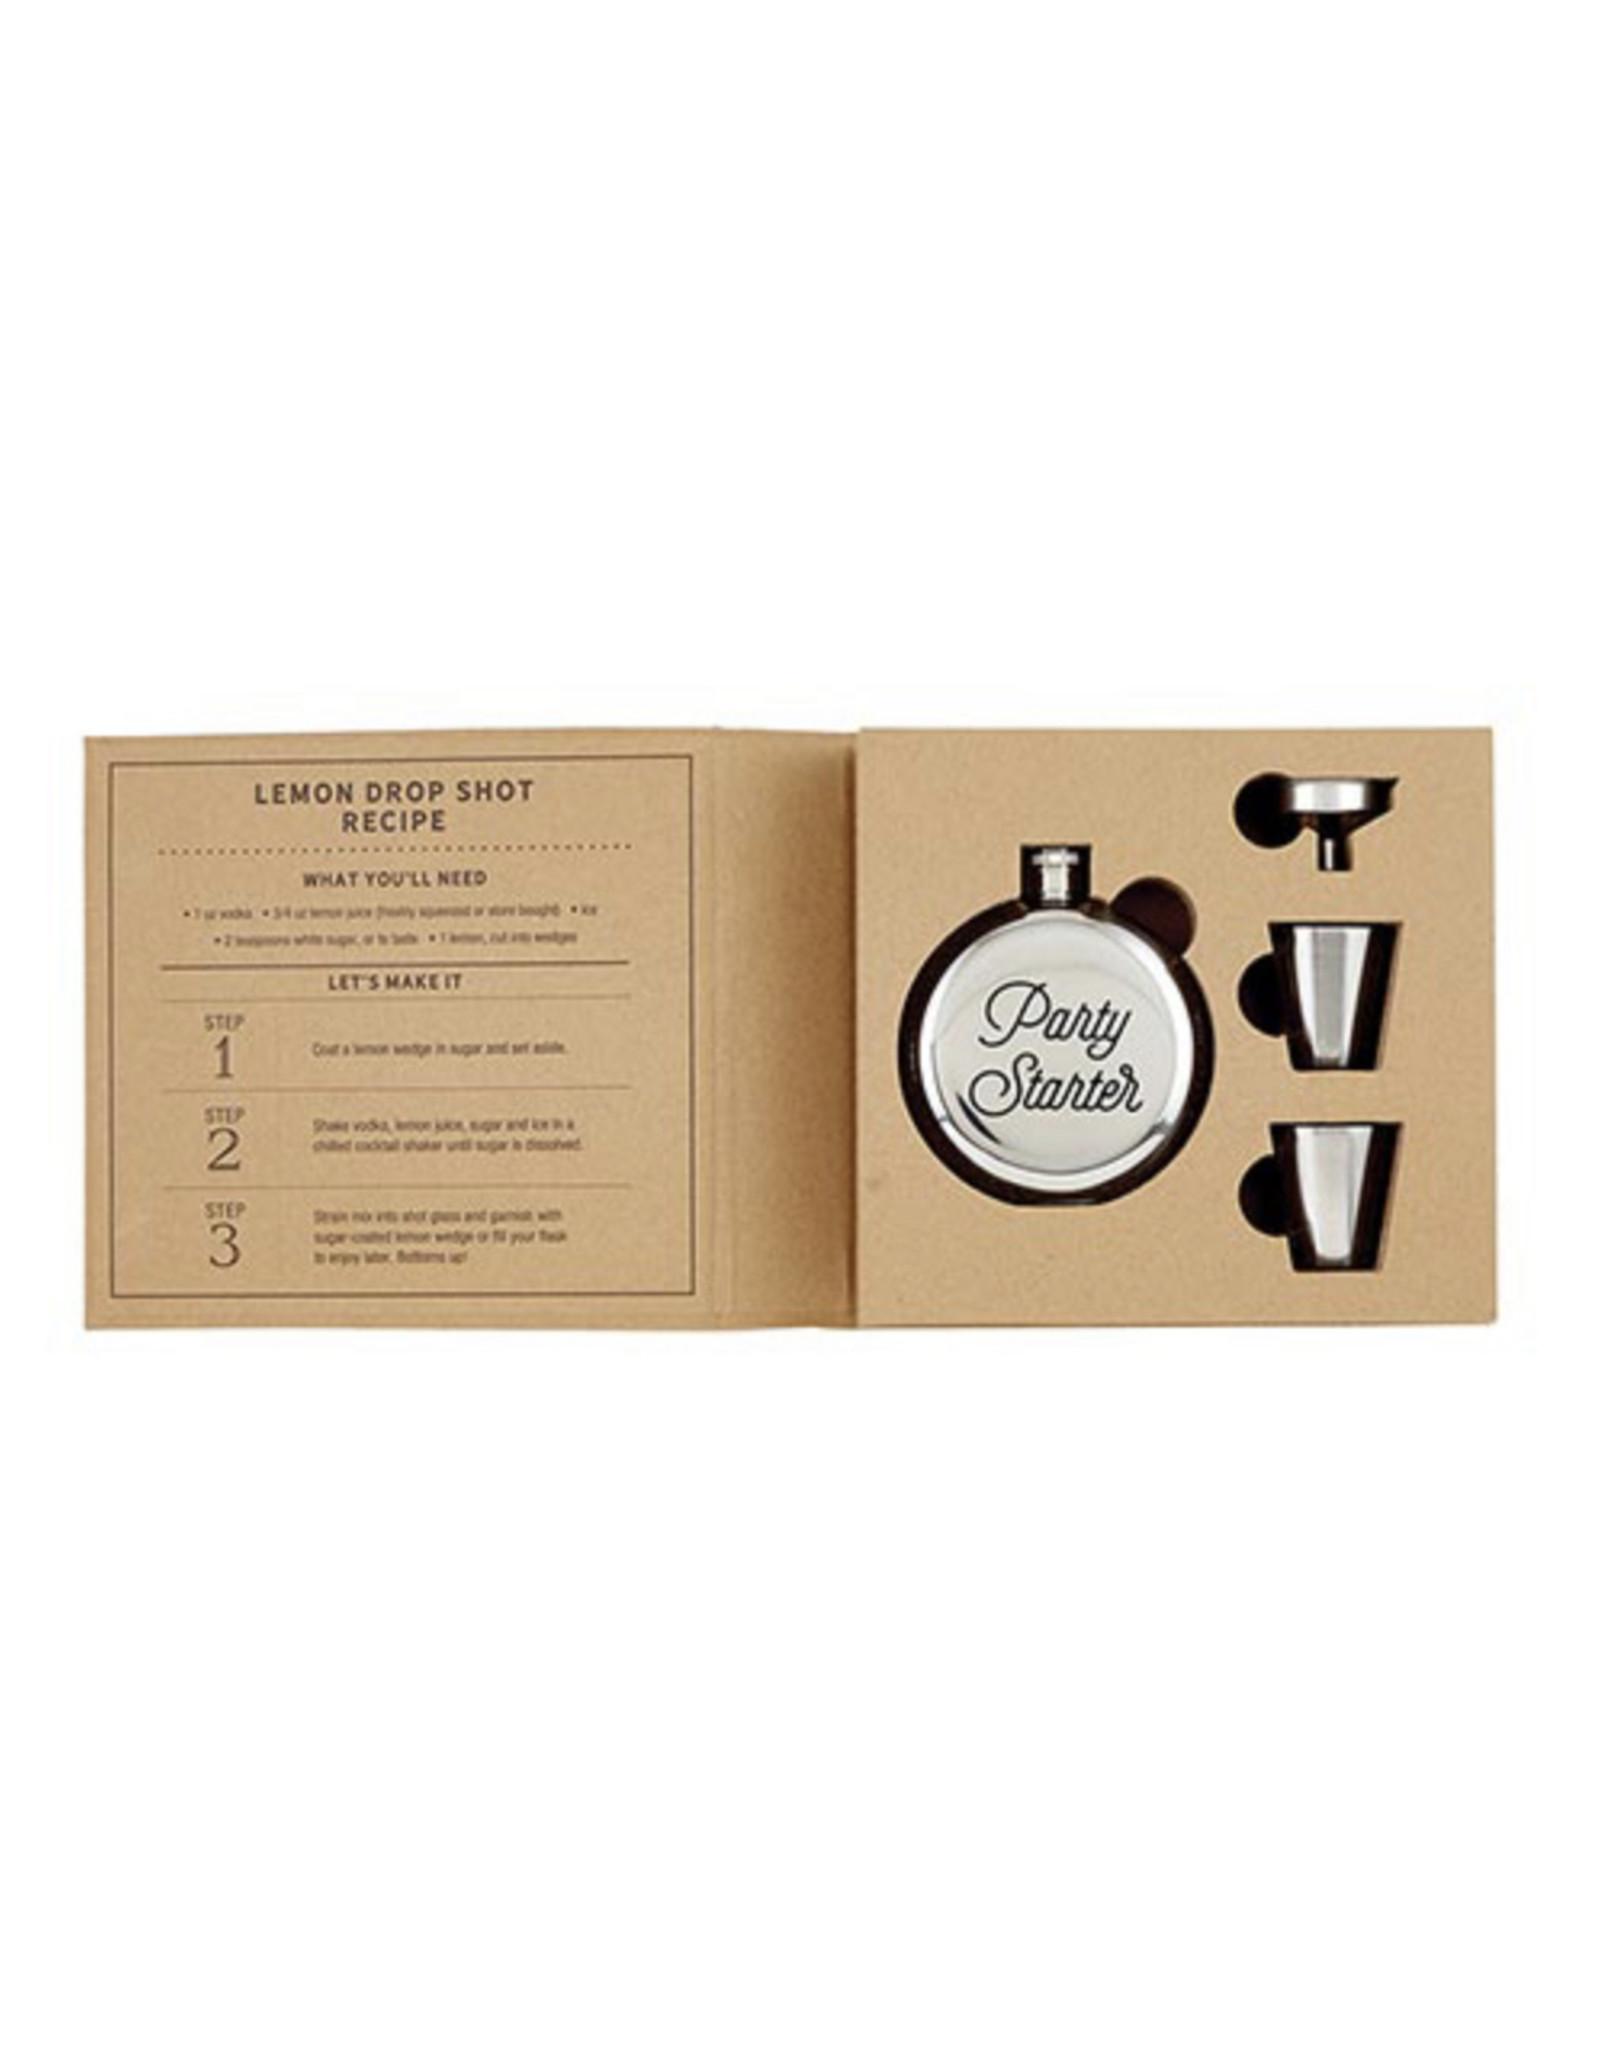 Santa barbara Cardboard Book Set-Flask